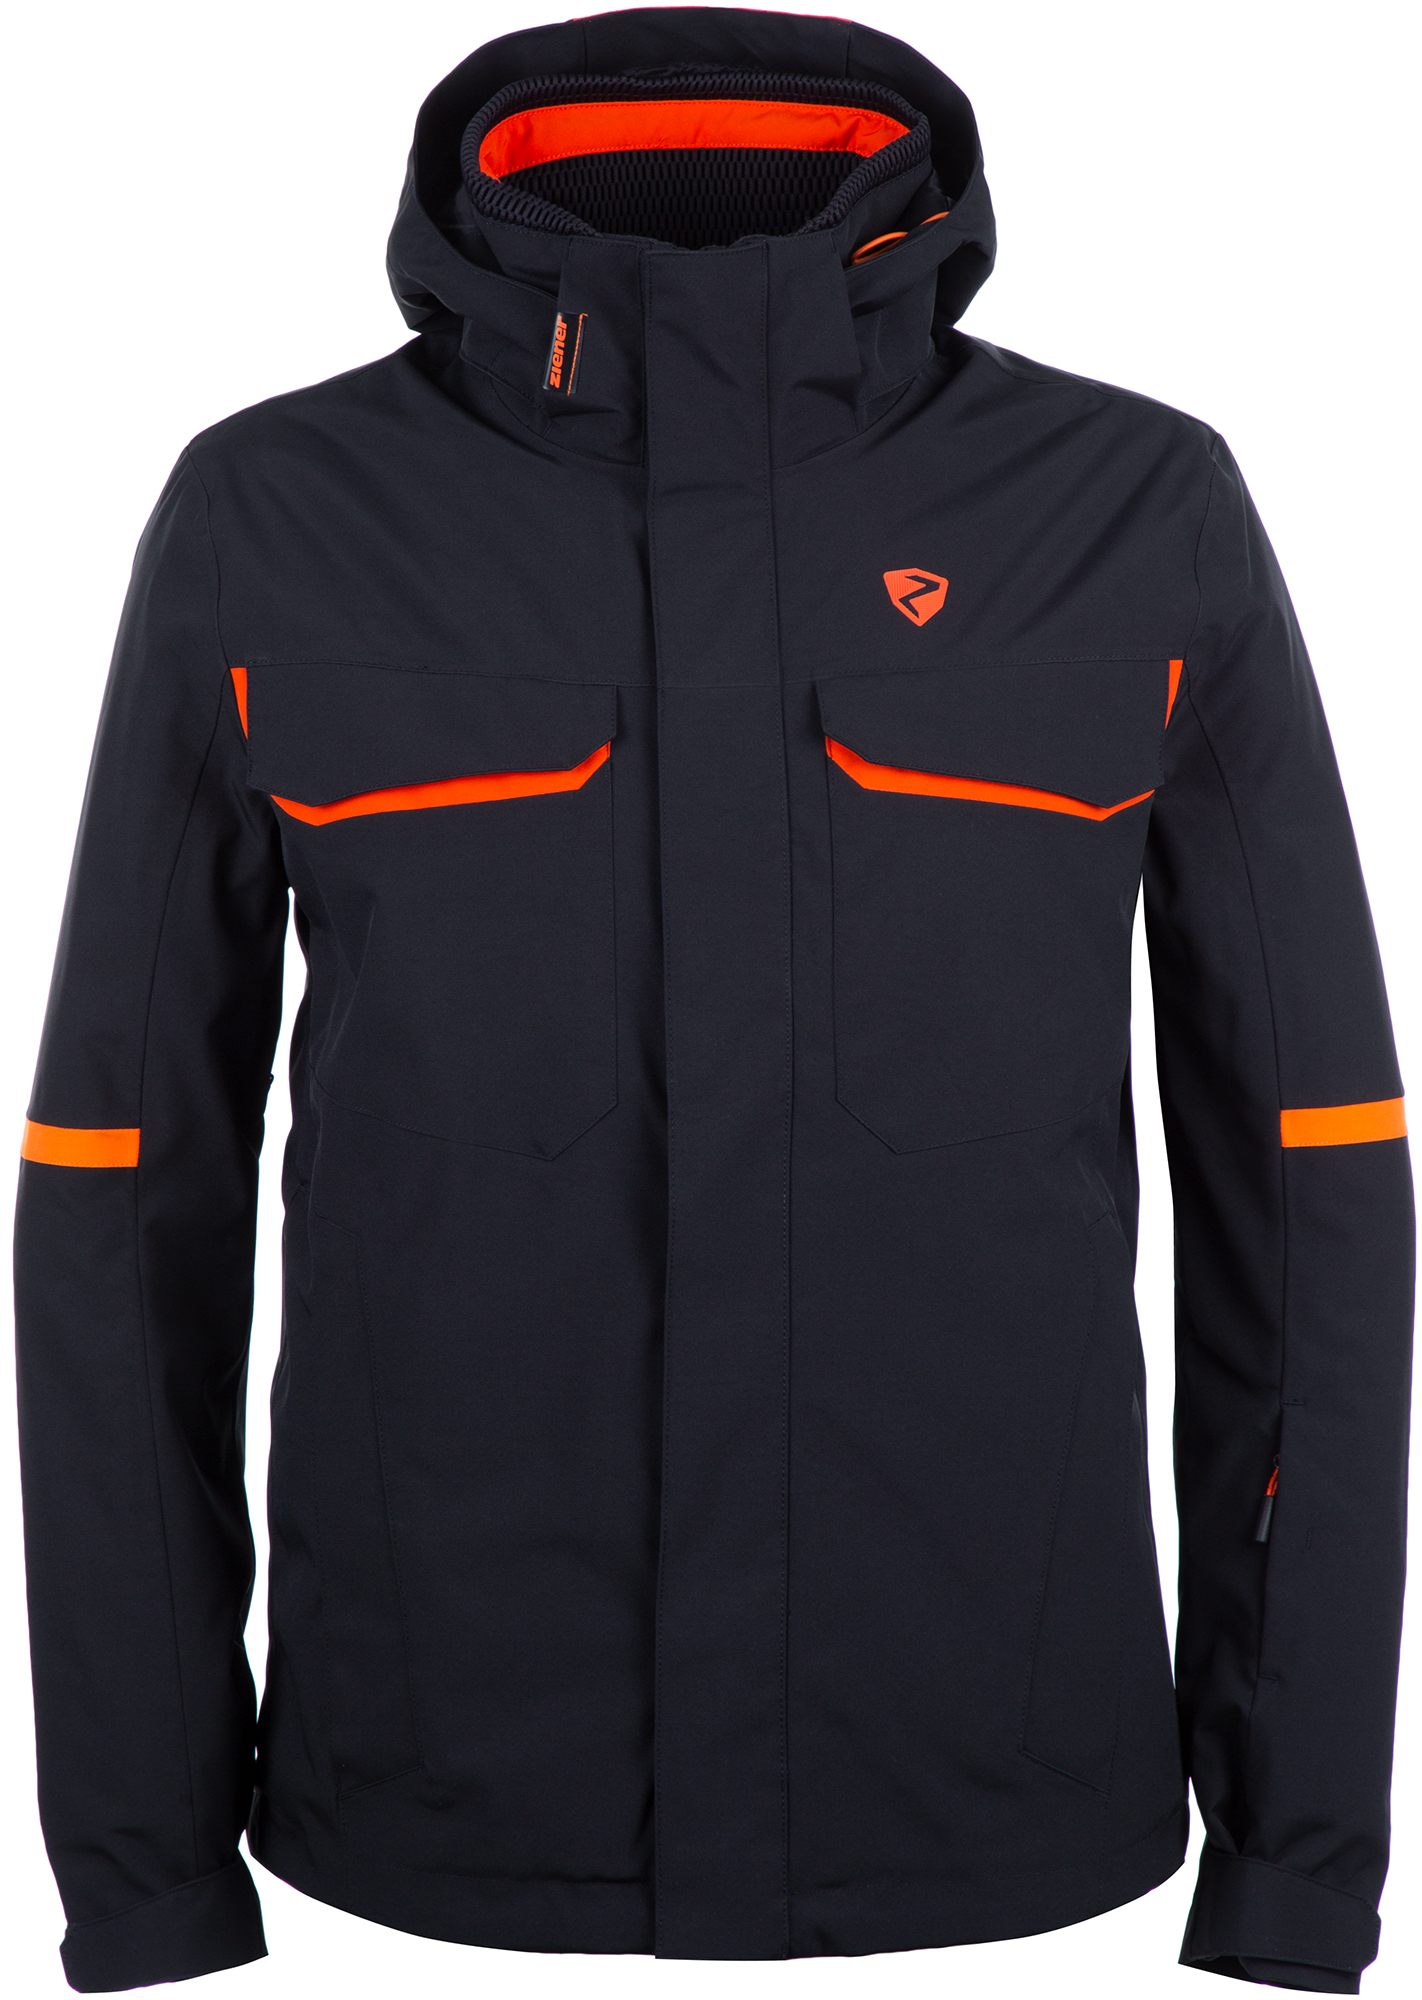 Ziener Куртка утепленная мужская Togiak, размер 54